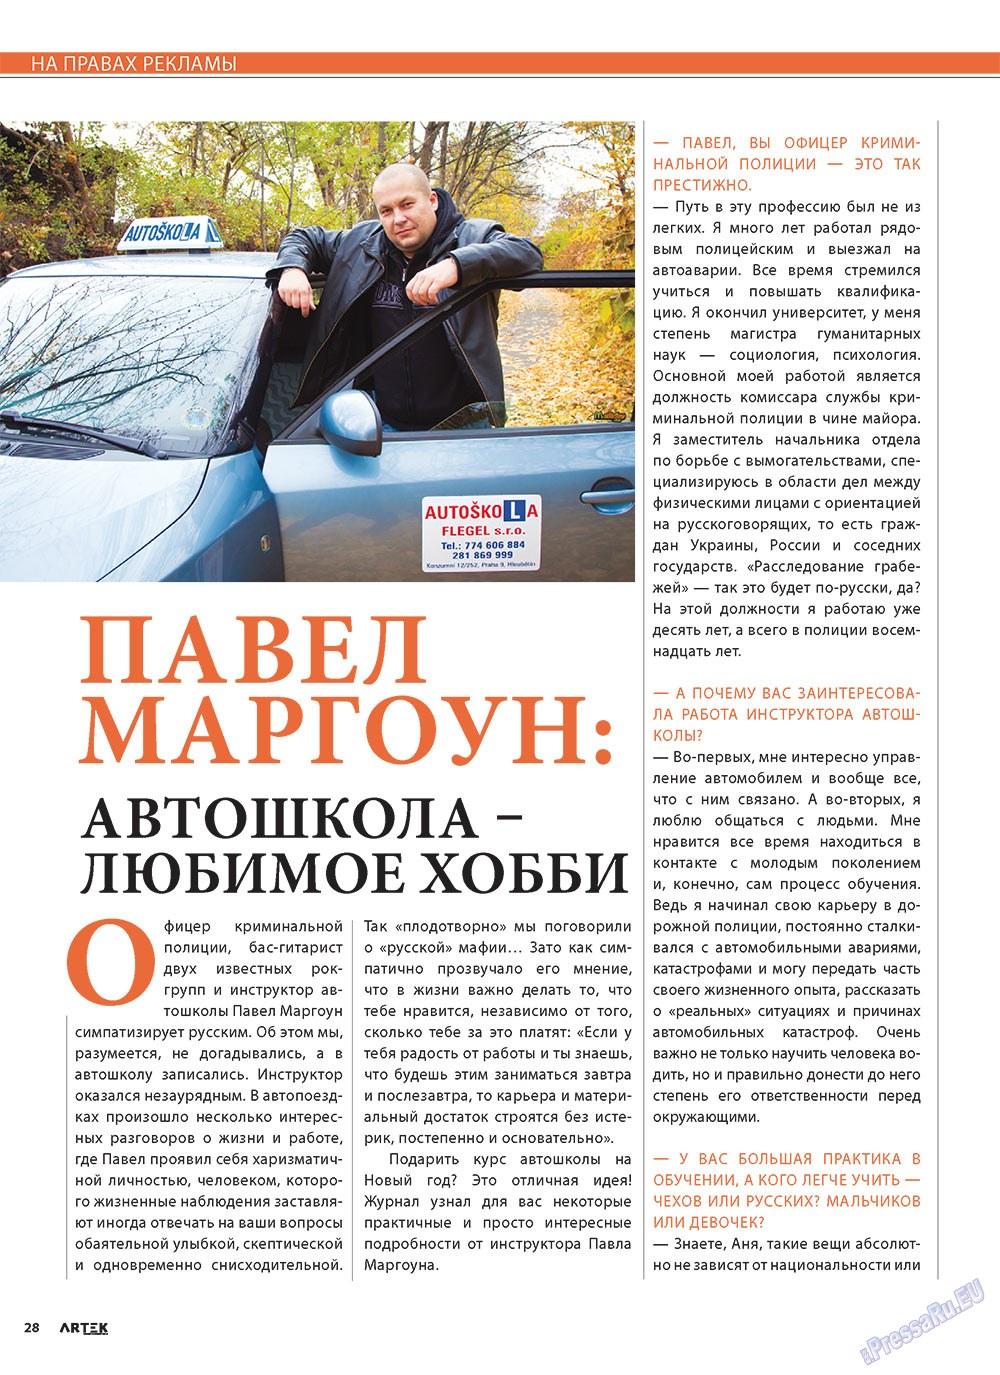 Артек (журнал). 2010 год, номер 6, стр. 30